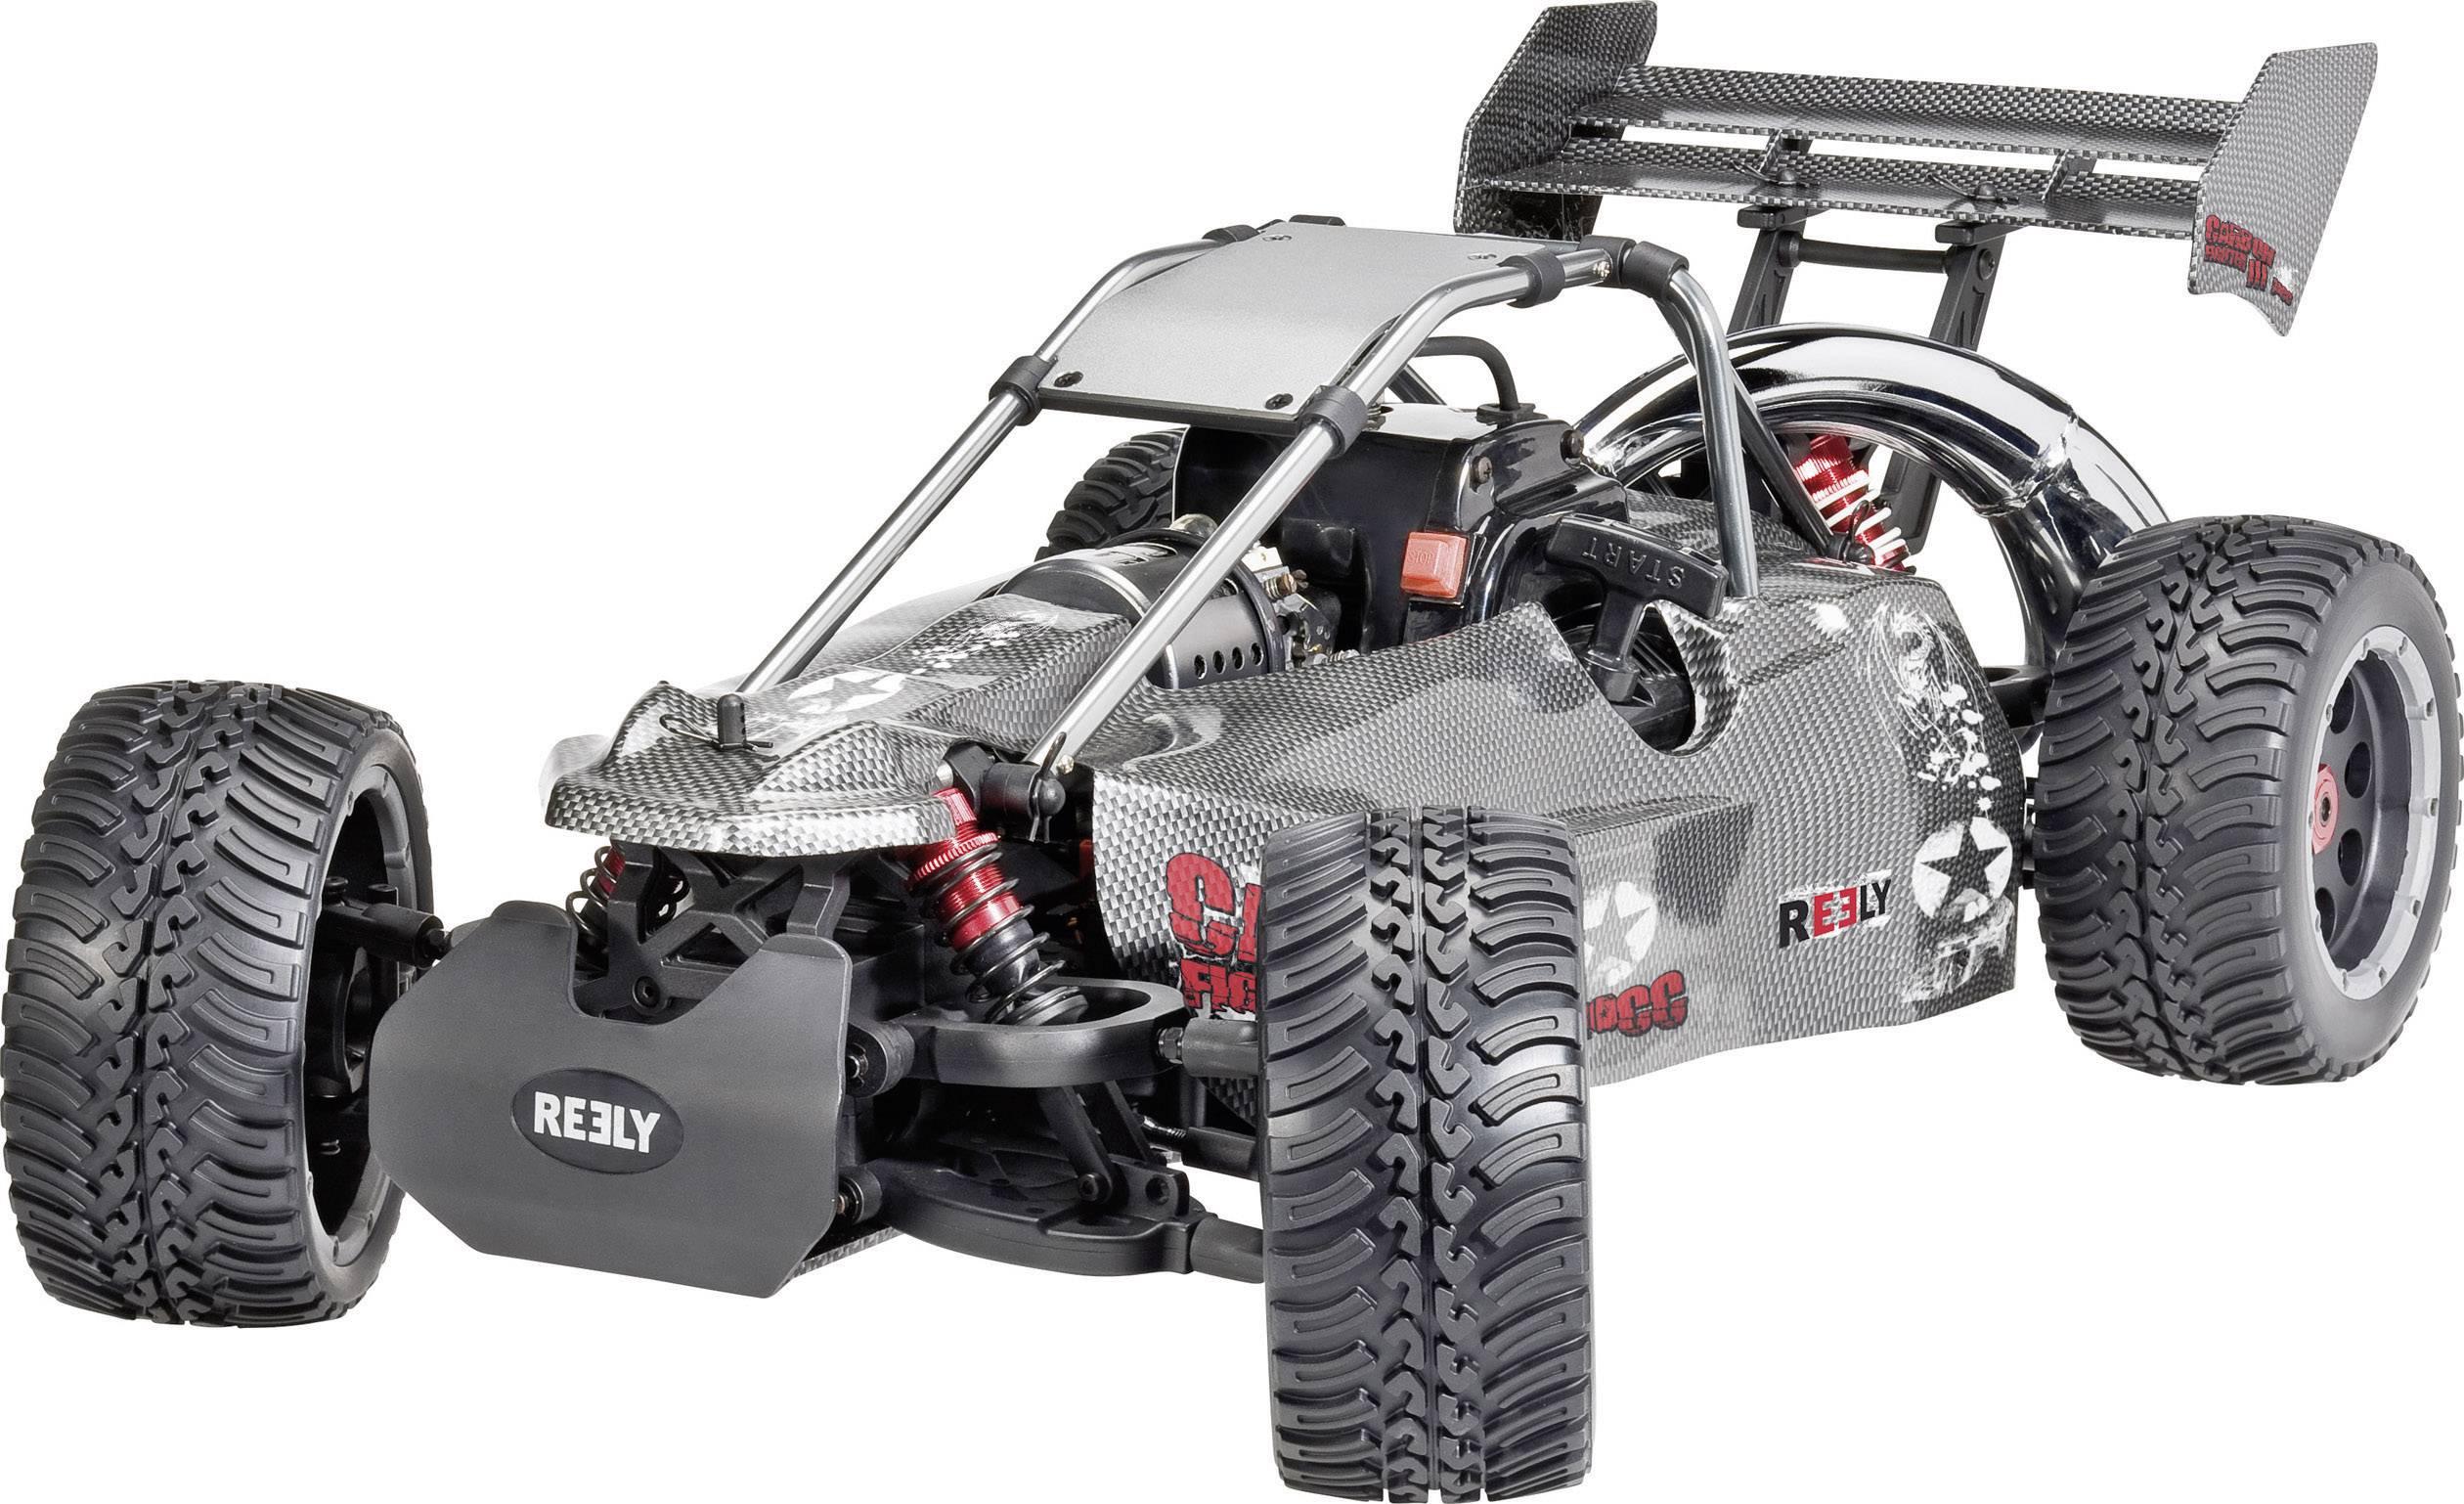 reely carbon fighter iii 1 6 rc modellauto benzin buggy heckantrieb rtr 2 4 ghz kaufen. Black Bedroom Furniture Sets. Home Design Ideas